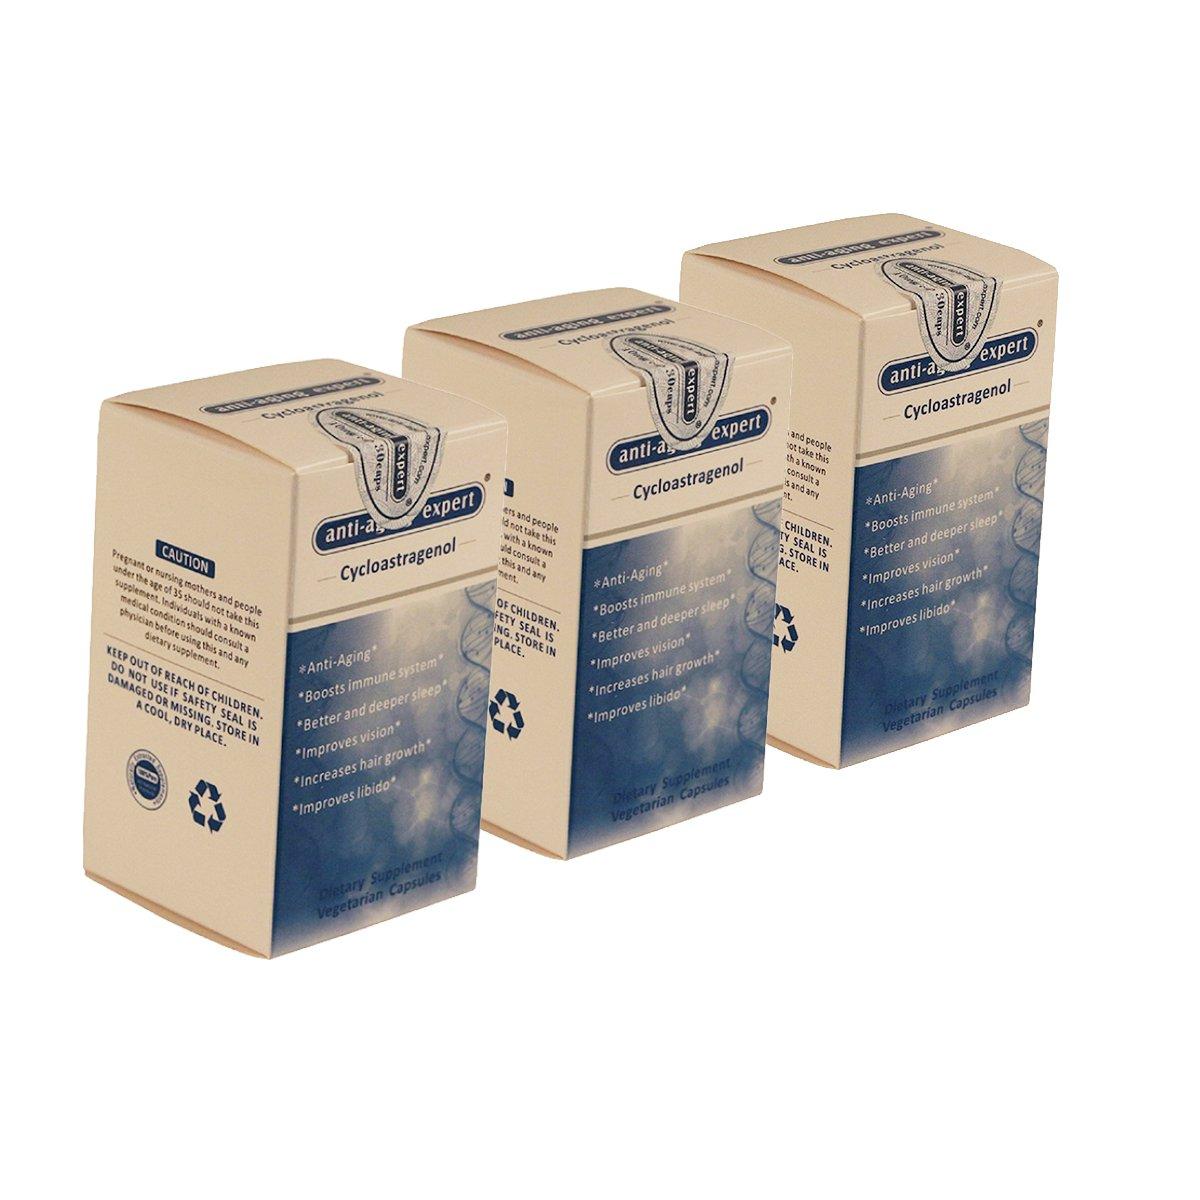 Cycloastragenol 99%+ |10mg, 30 Vegetarian Capsules,3 bottles| Anti-aging expert